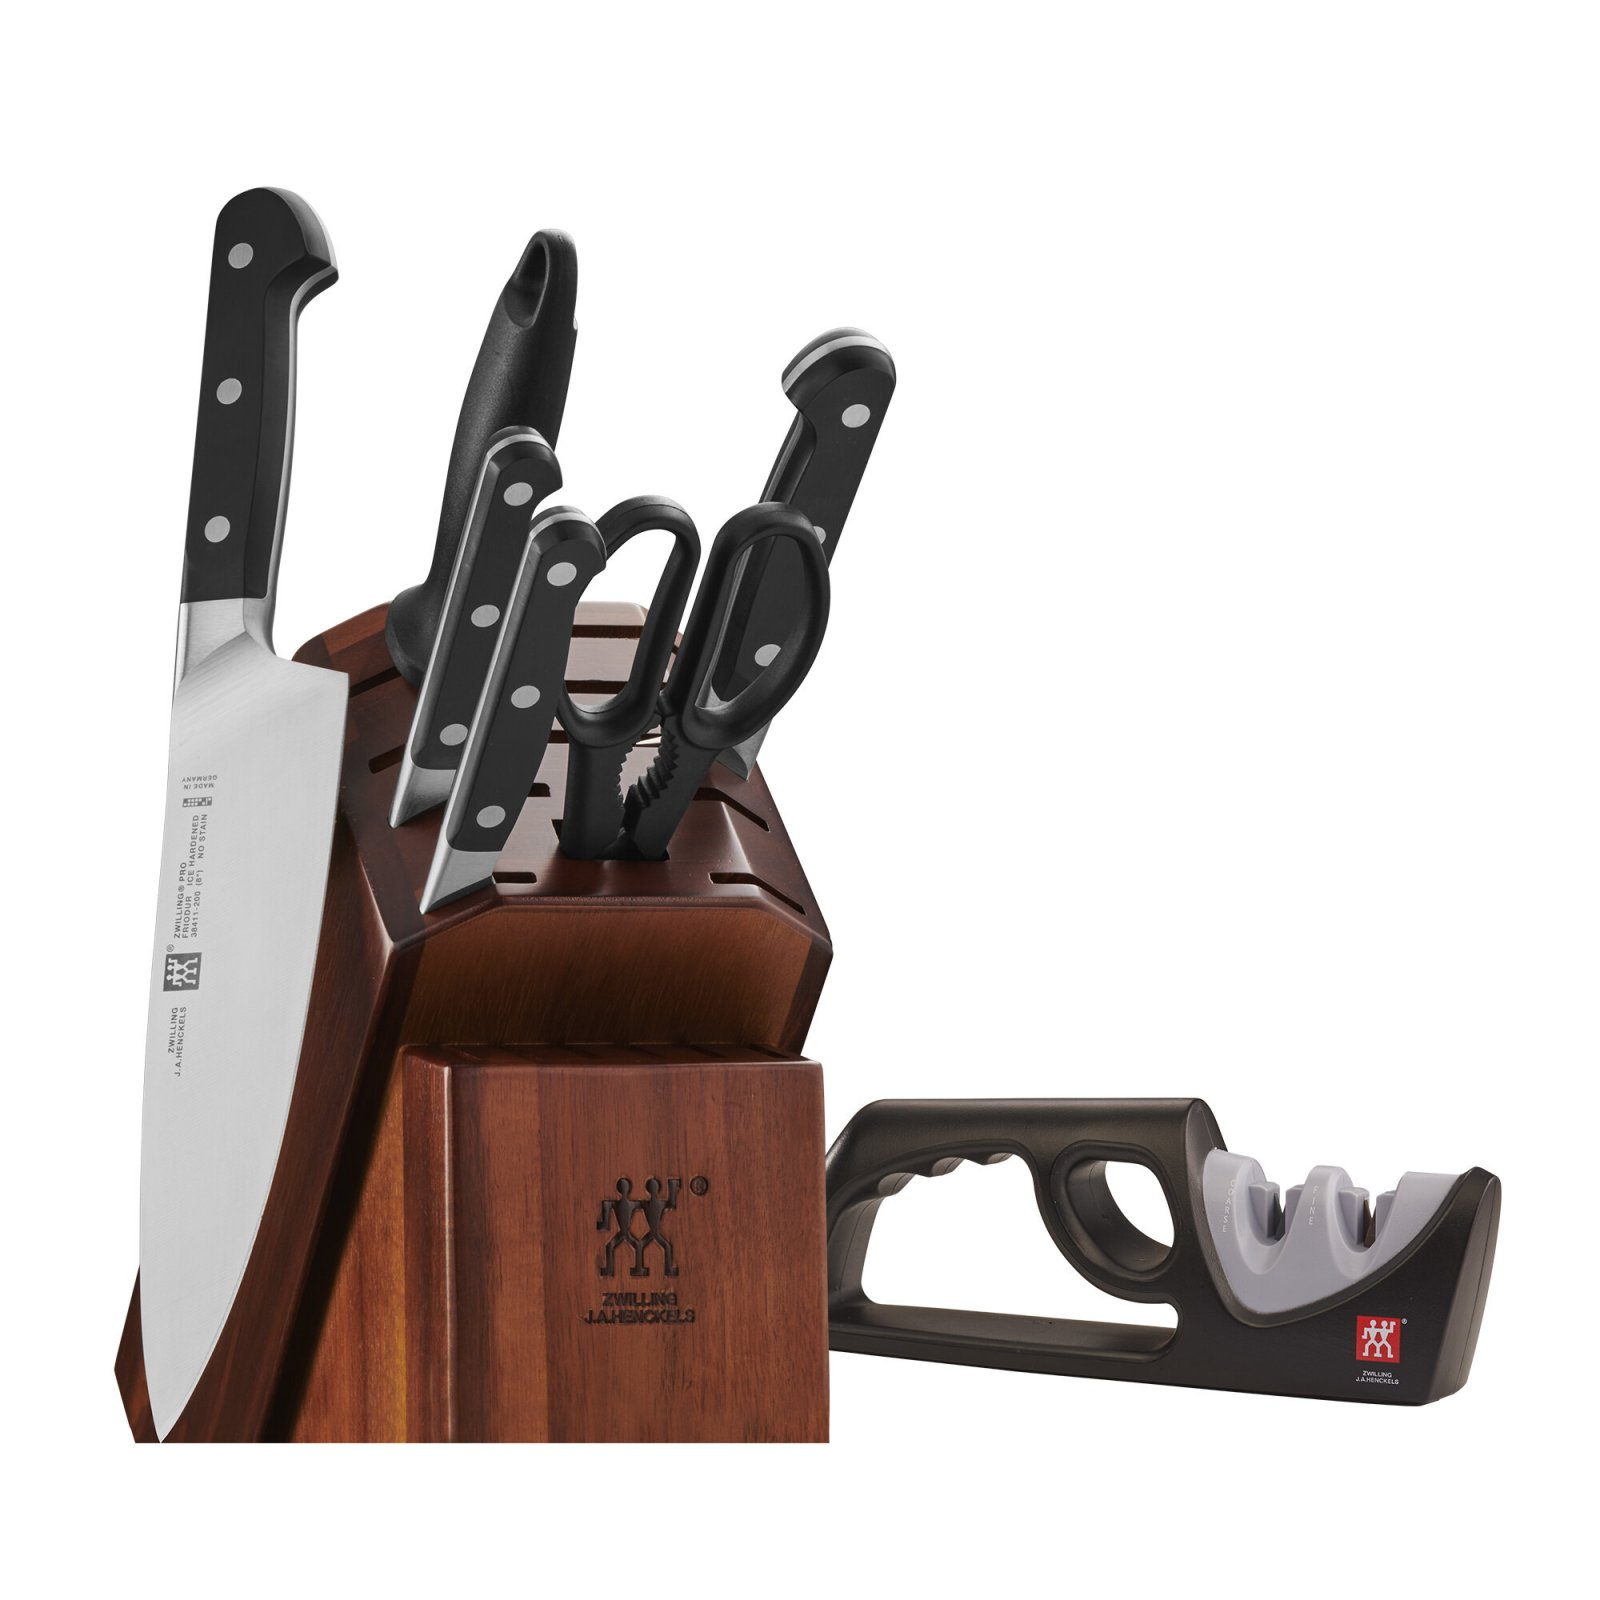 Zwilling J.A. Henckles Pro 7pc Knife Block Set